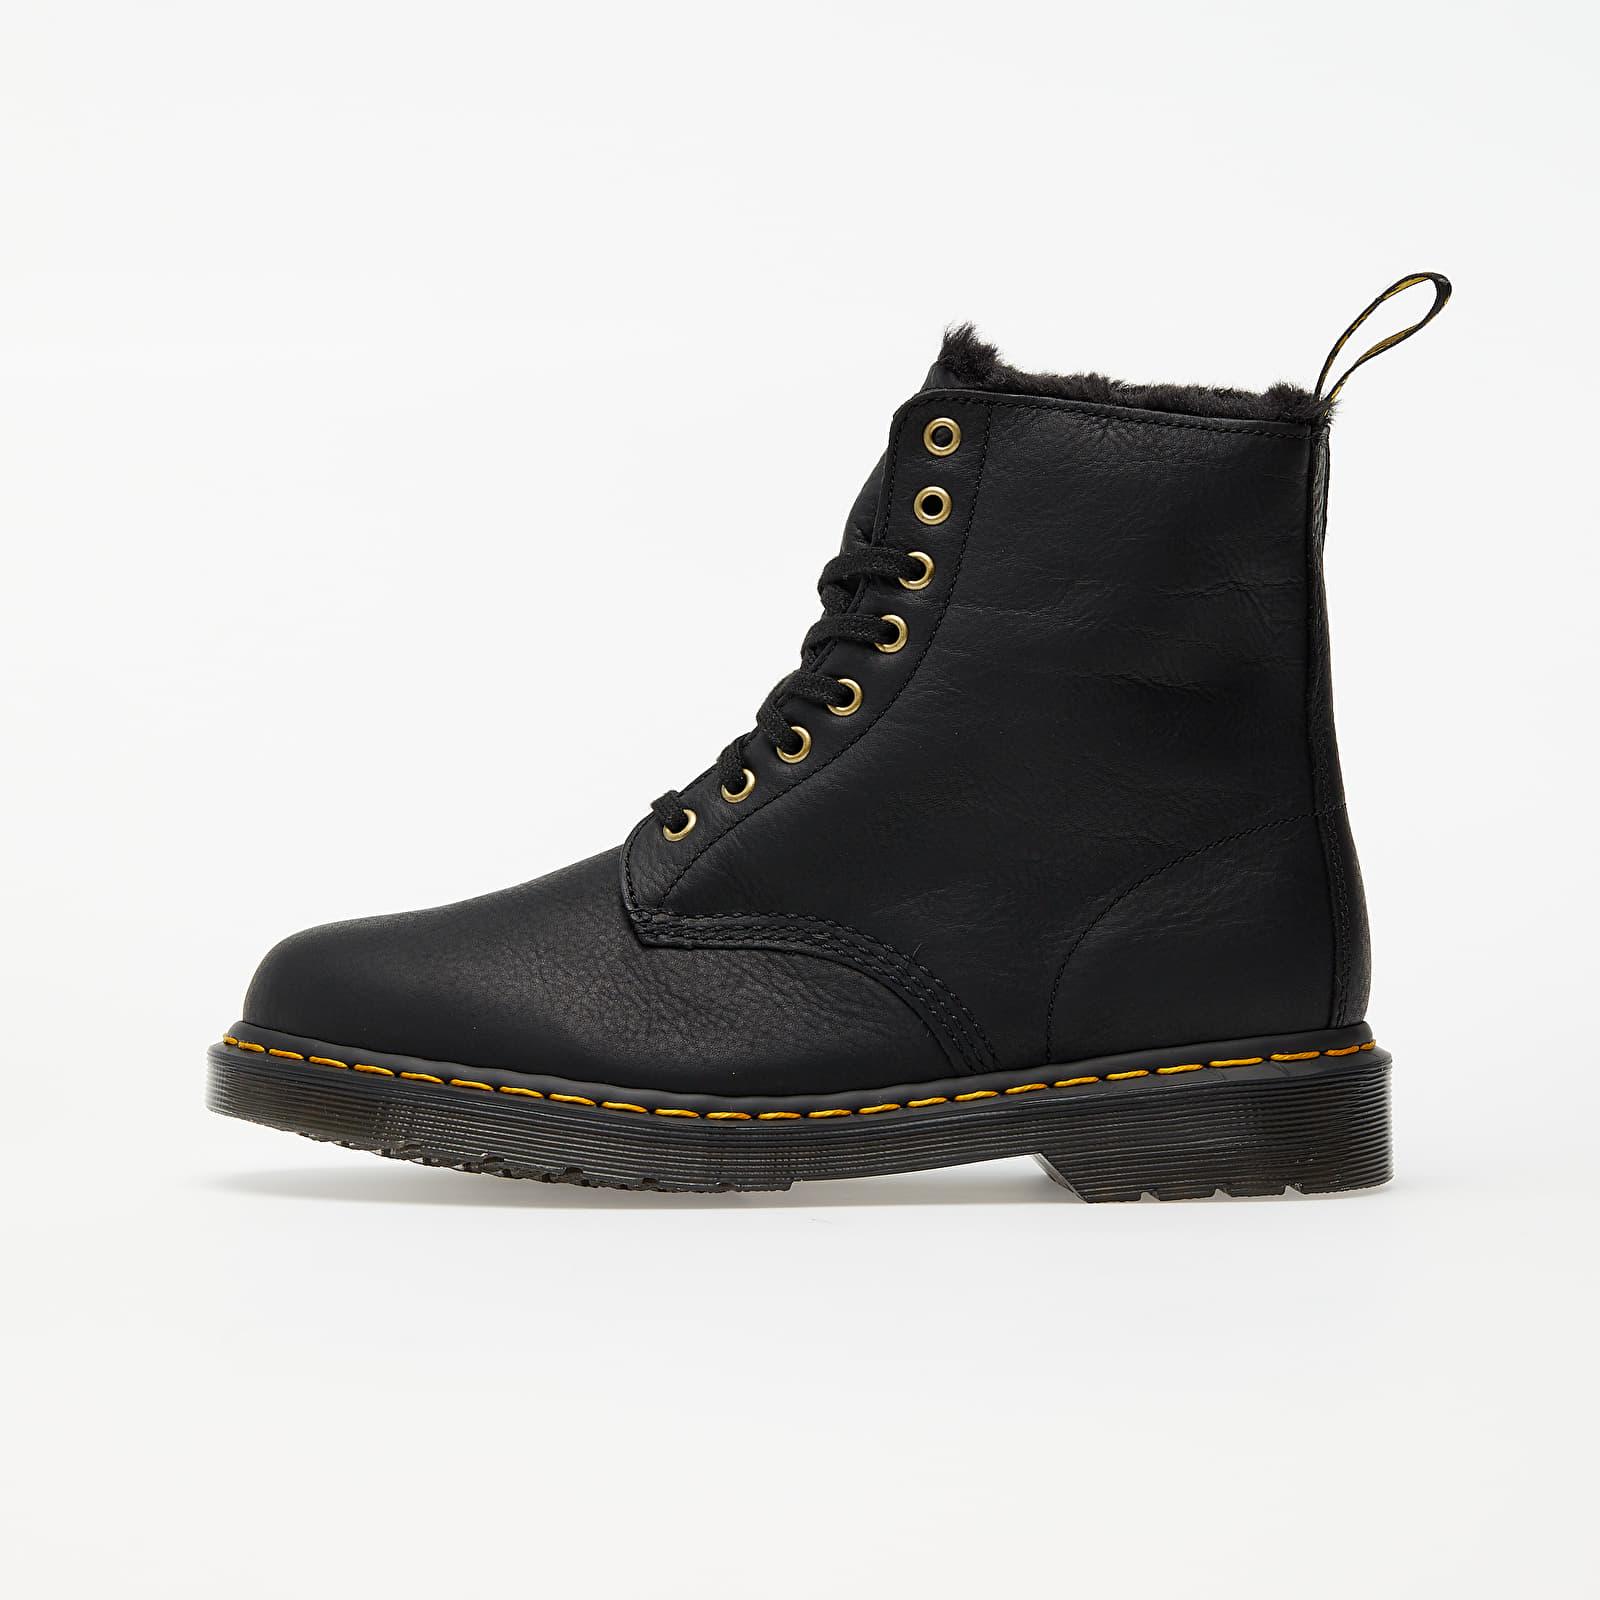 Dr. Martens 1460 Pascal Fl 8 Eye Boot Black DM25533001